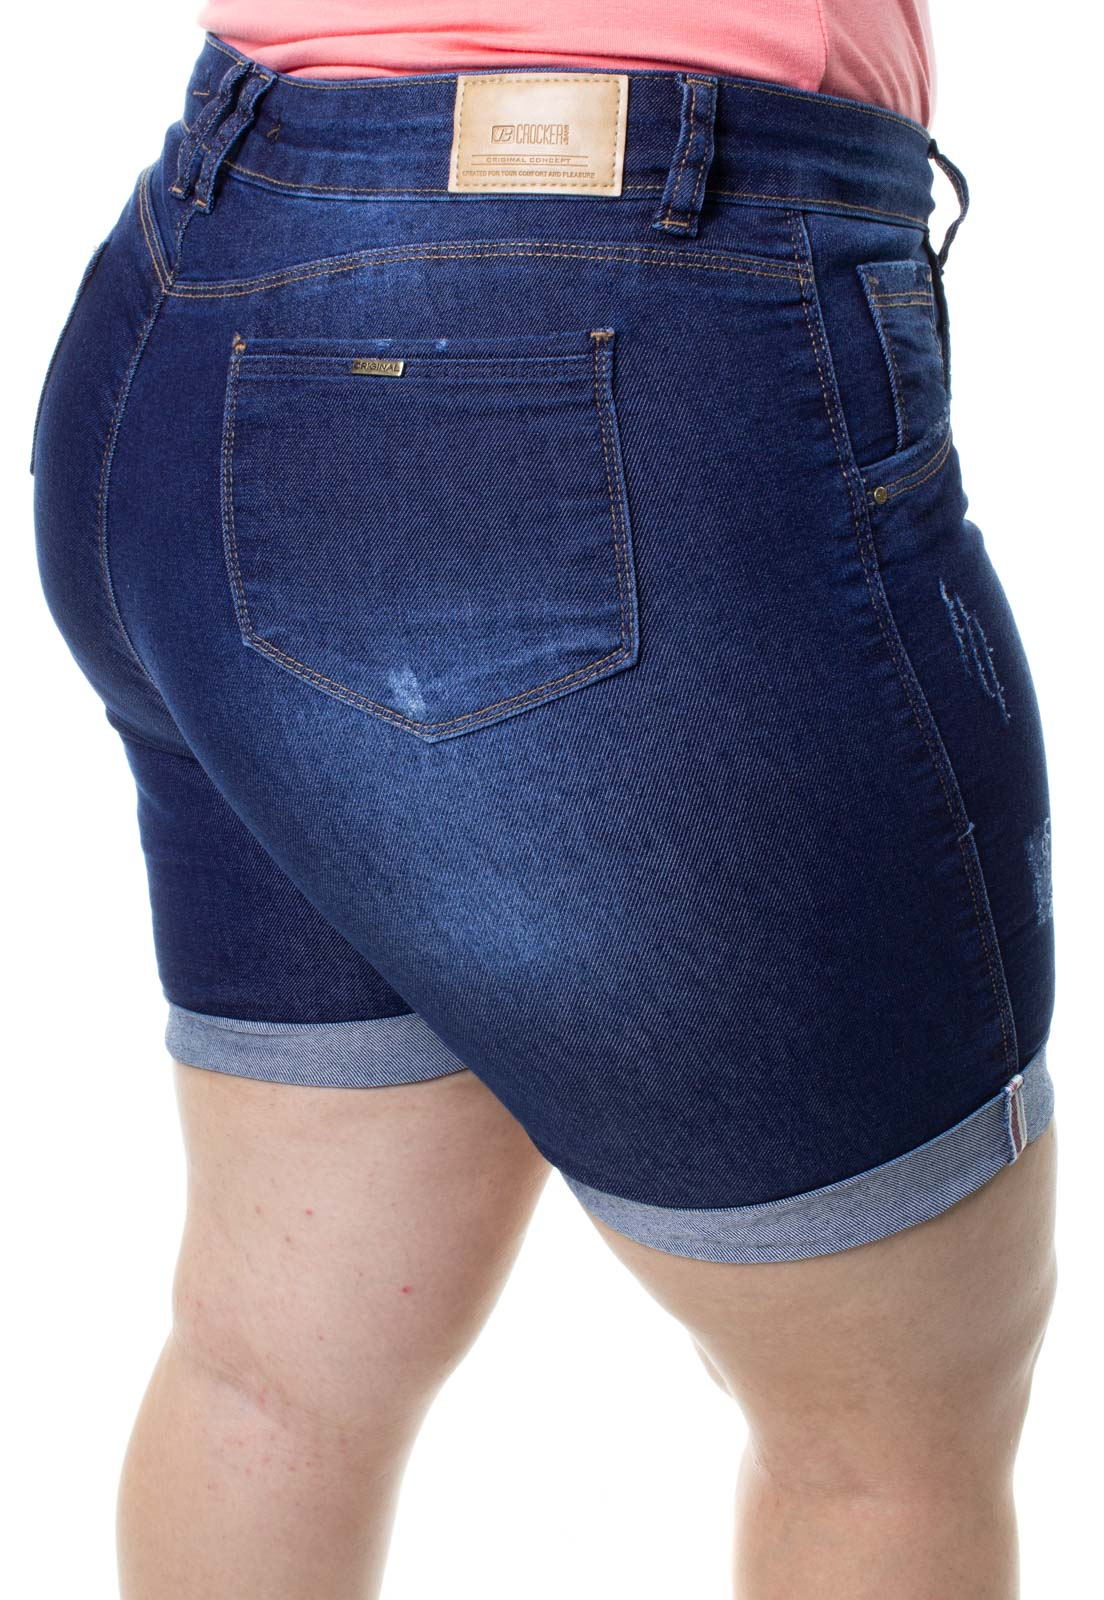 Bermuda Feminina Plus Size Crocker - 48299  - CROCKER JEANS